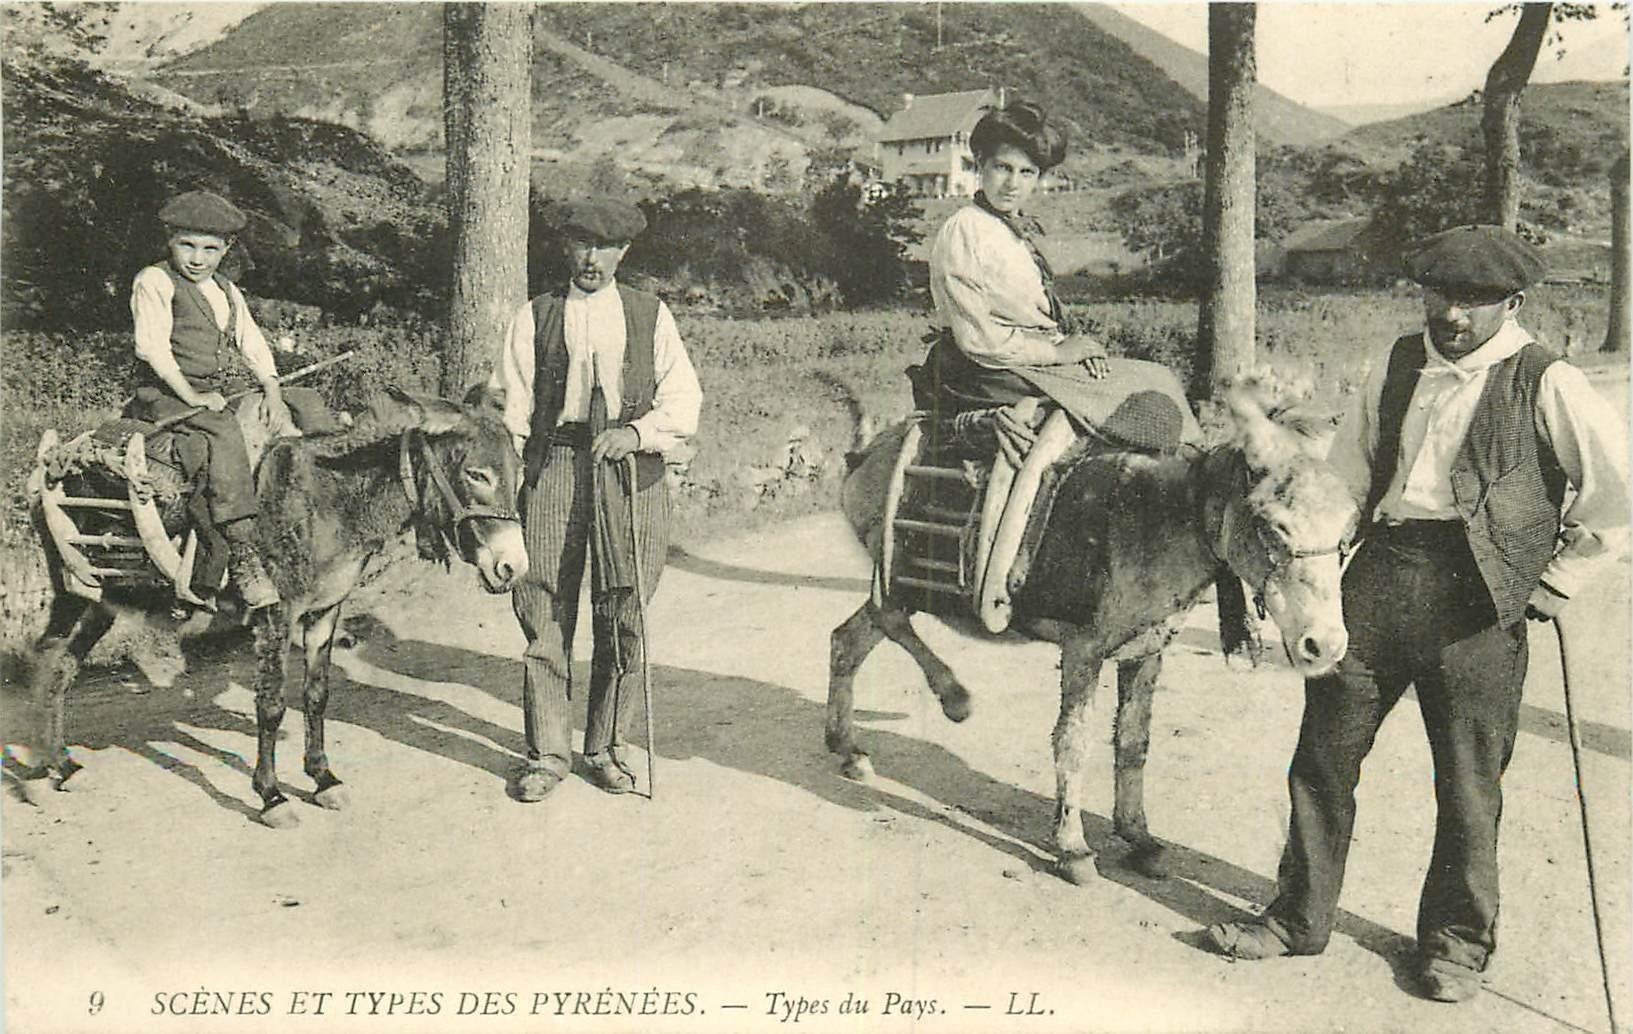 WW 64 LES PYRENEES. Types du Pays Aniers pour ballades 1910